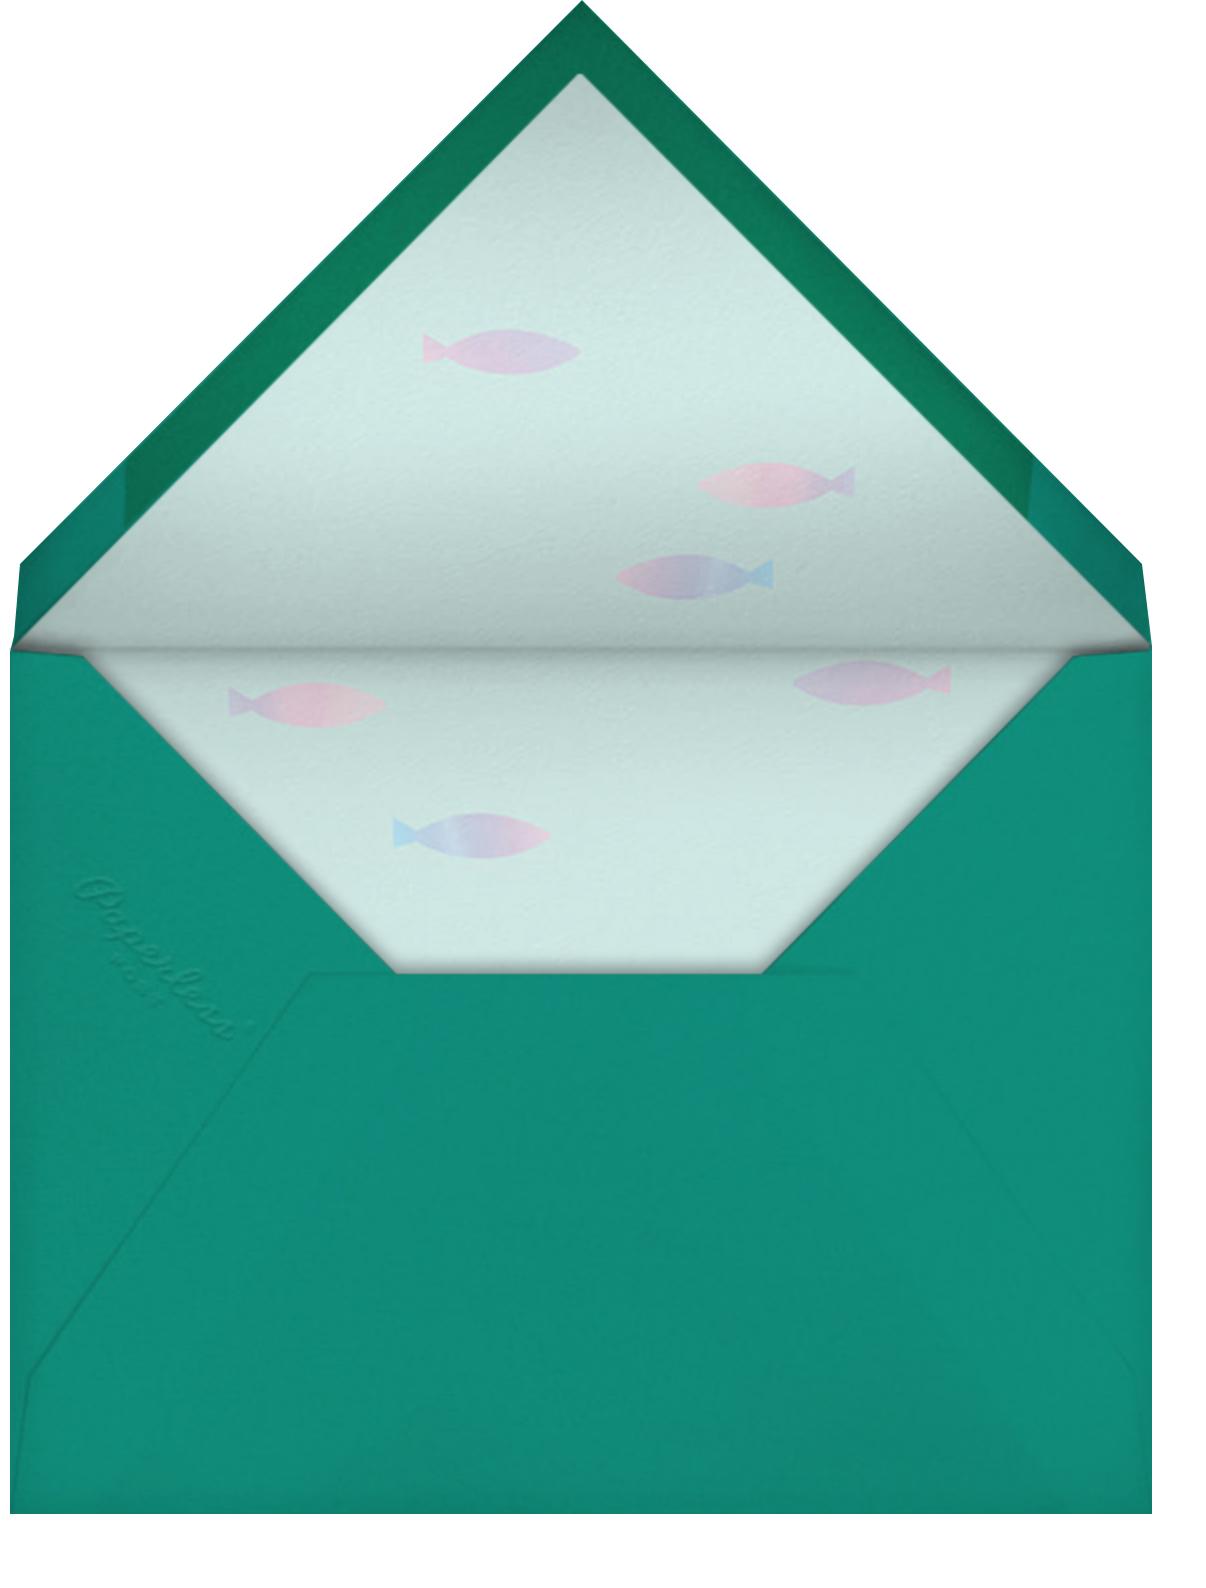 Let's Shellebrate - Meringue - Meri Meri - Kids' birthday - envelope back